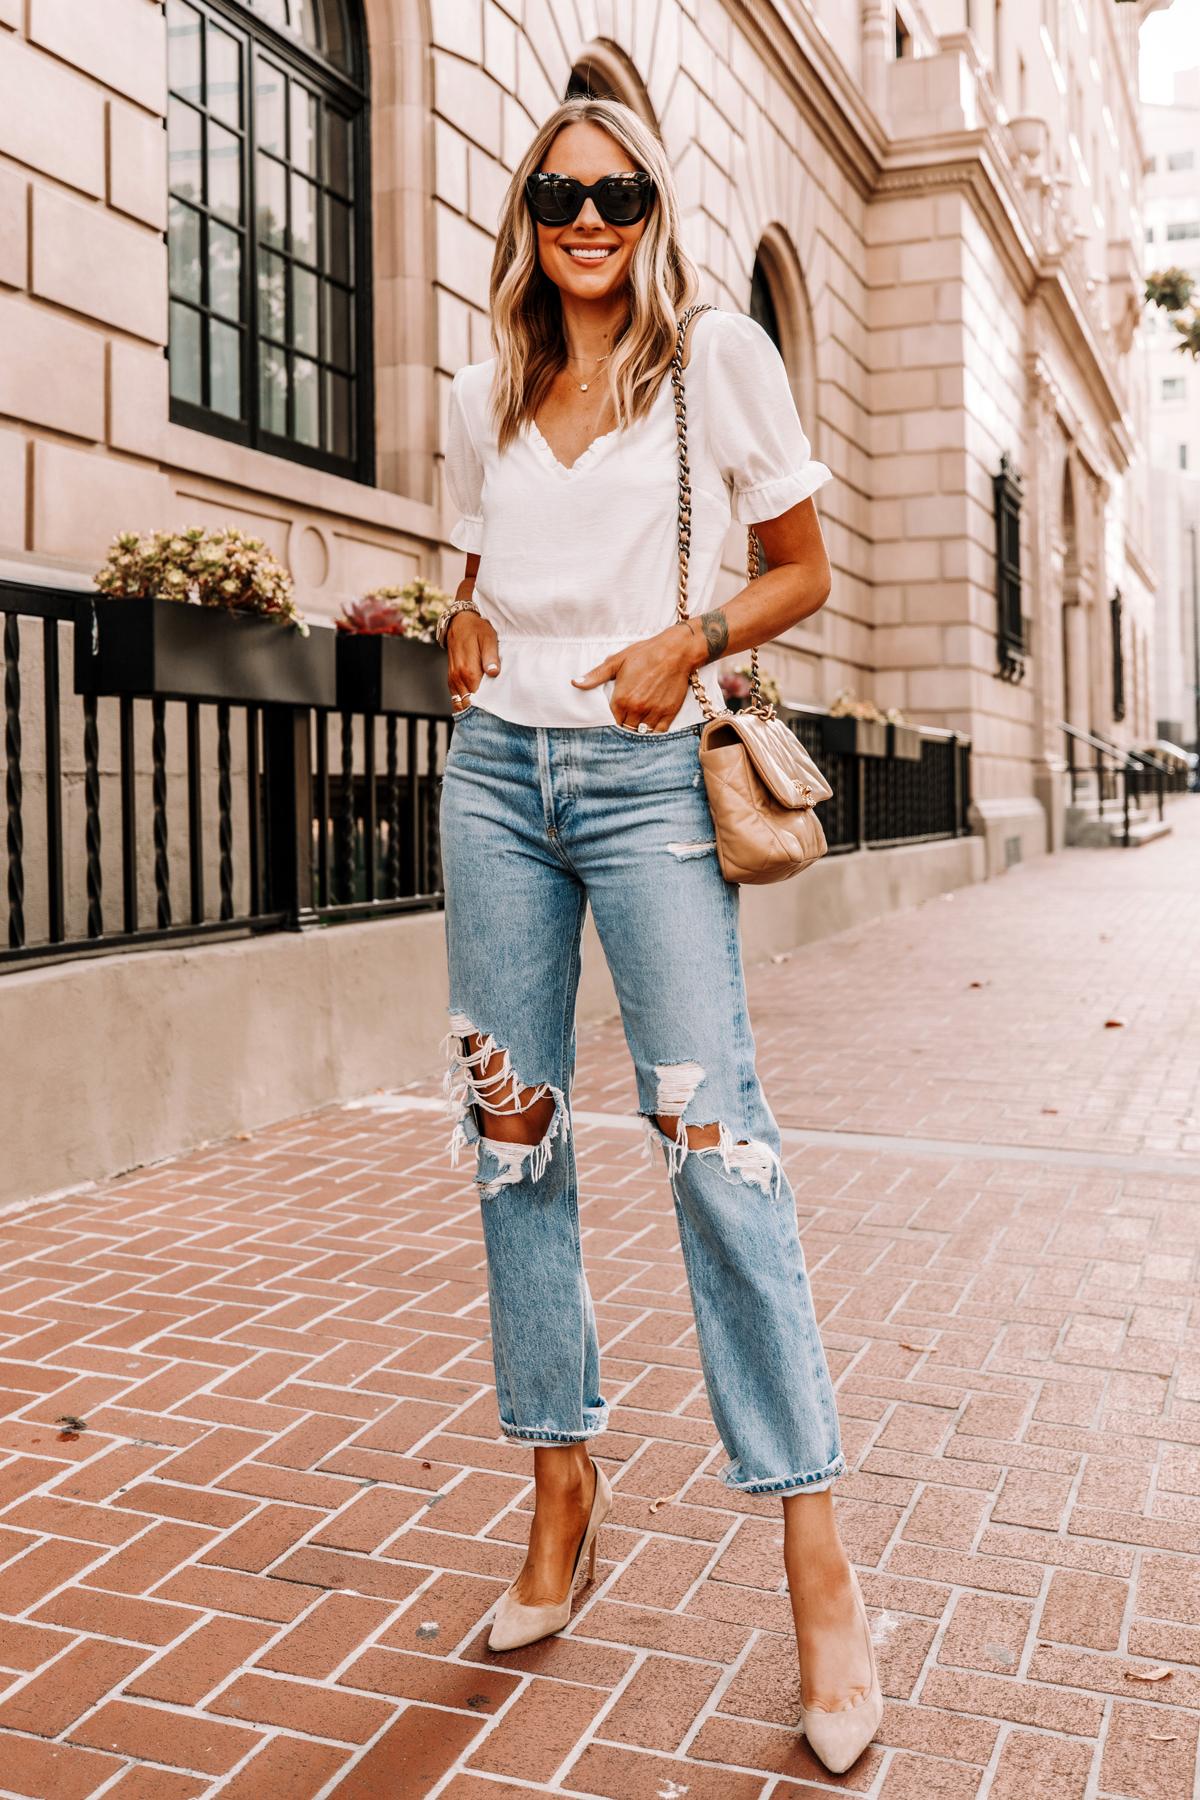 Fashion Jackson Wearing Topshop White Peplum Top AGOLDE Ripped 90s Jeans Nude Pumps Chanel 19 Beige Handbag 1